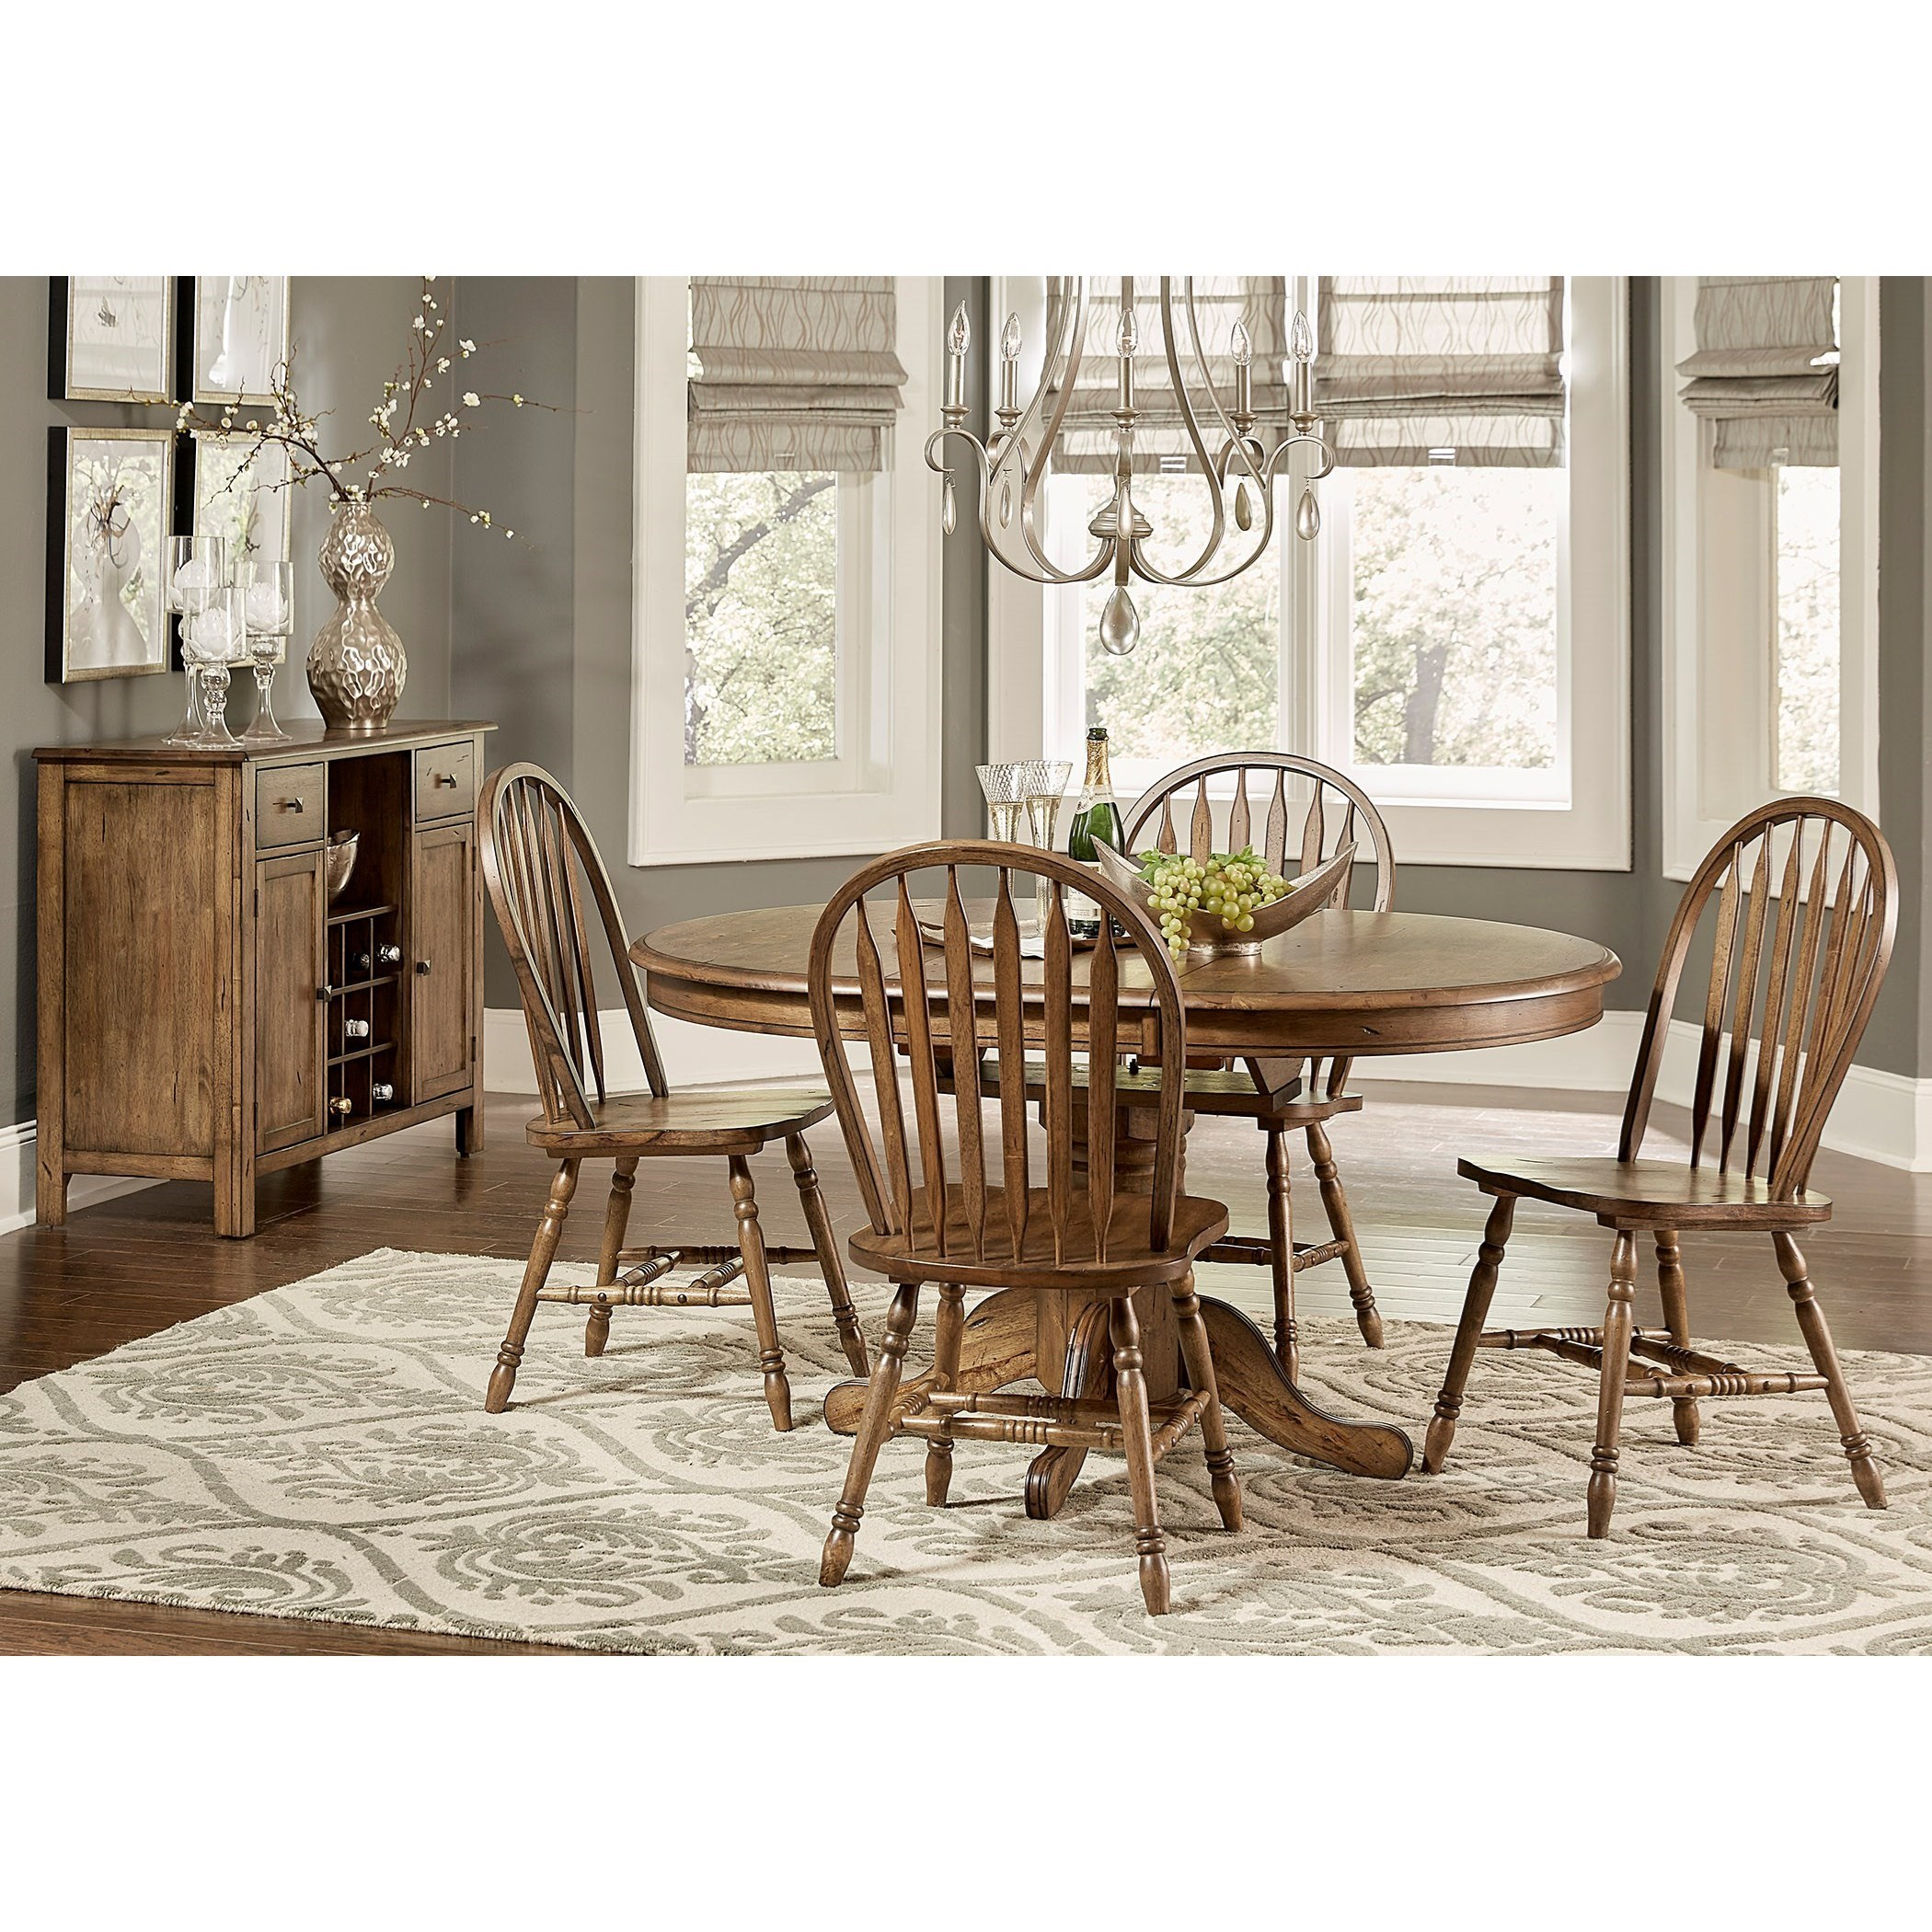 Liberty Furniture Carolina Crossing Casual Dining Room Group